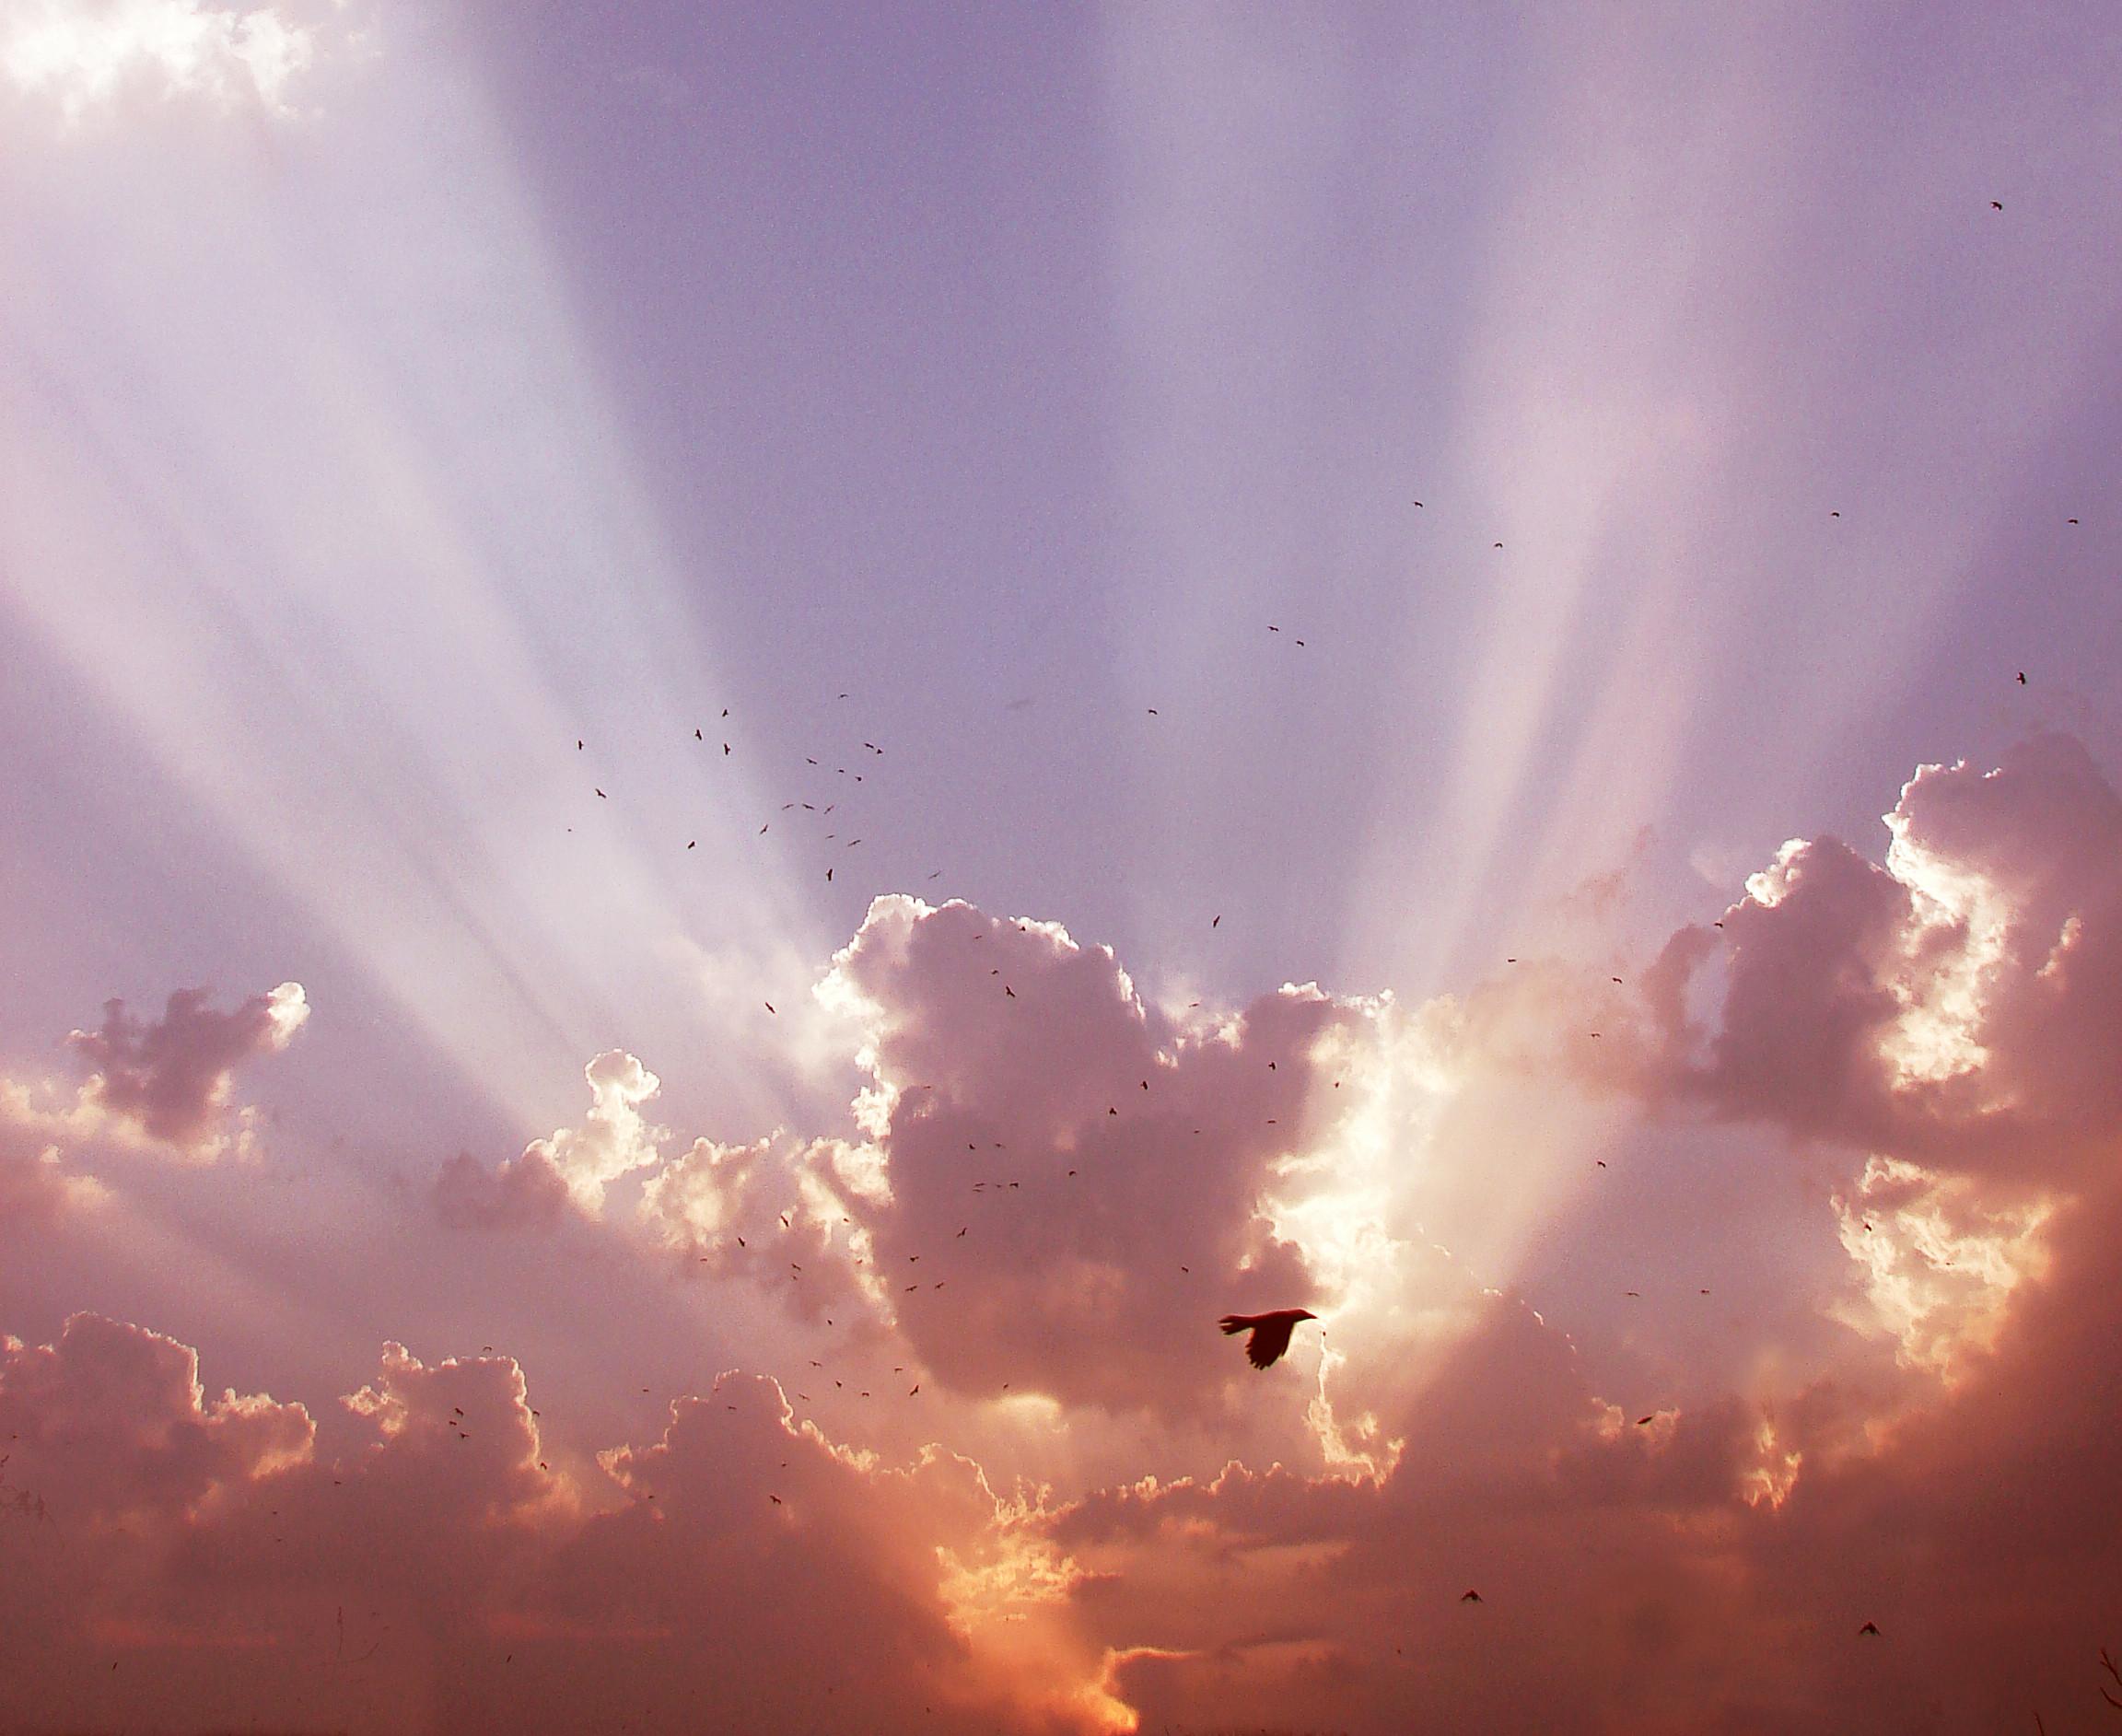 Heavenly light 1600x1200px #618723